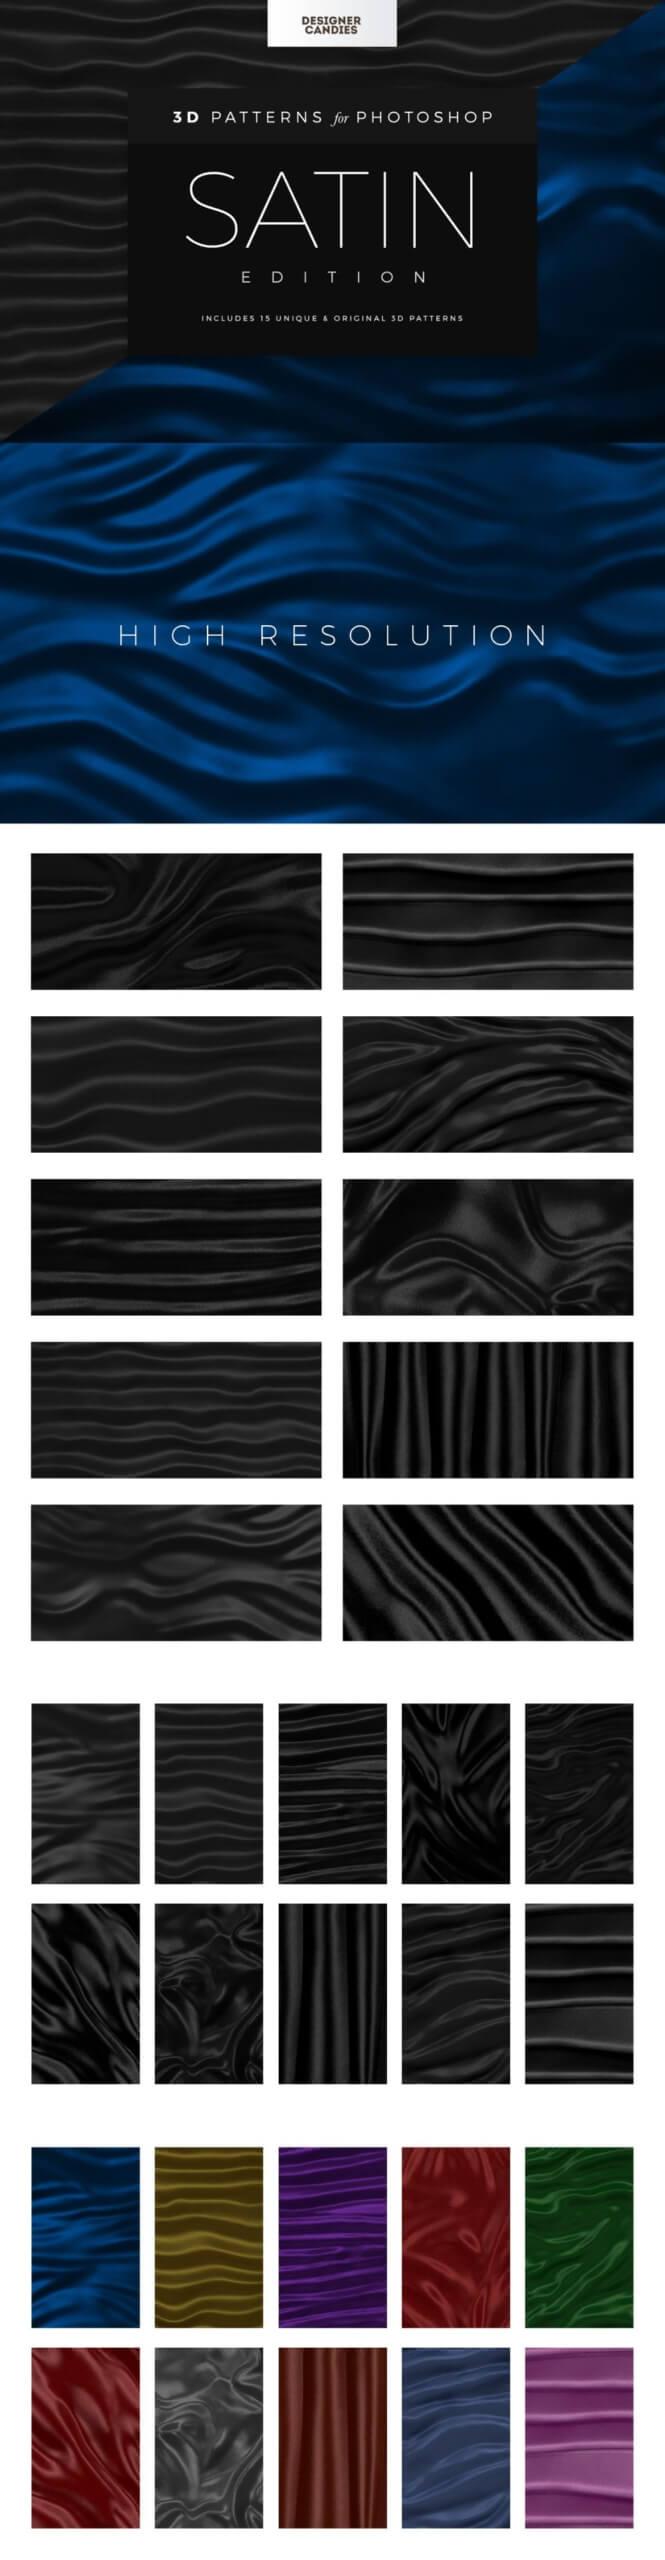 Seamless Silk and Saturn Fabric Patterns